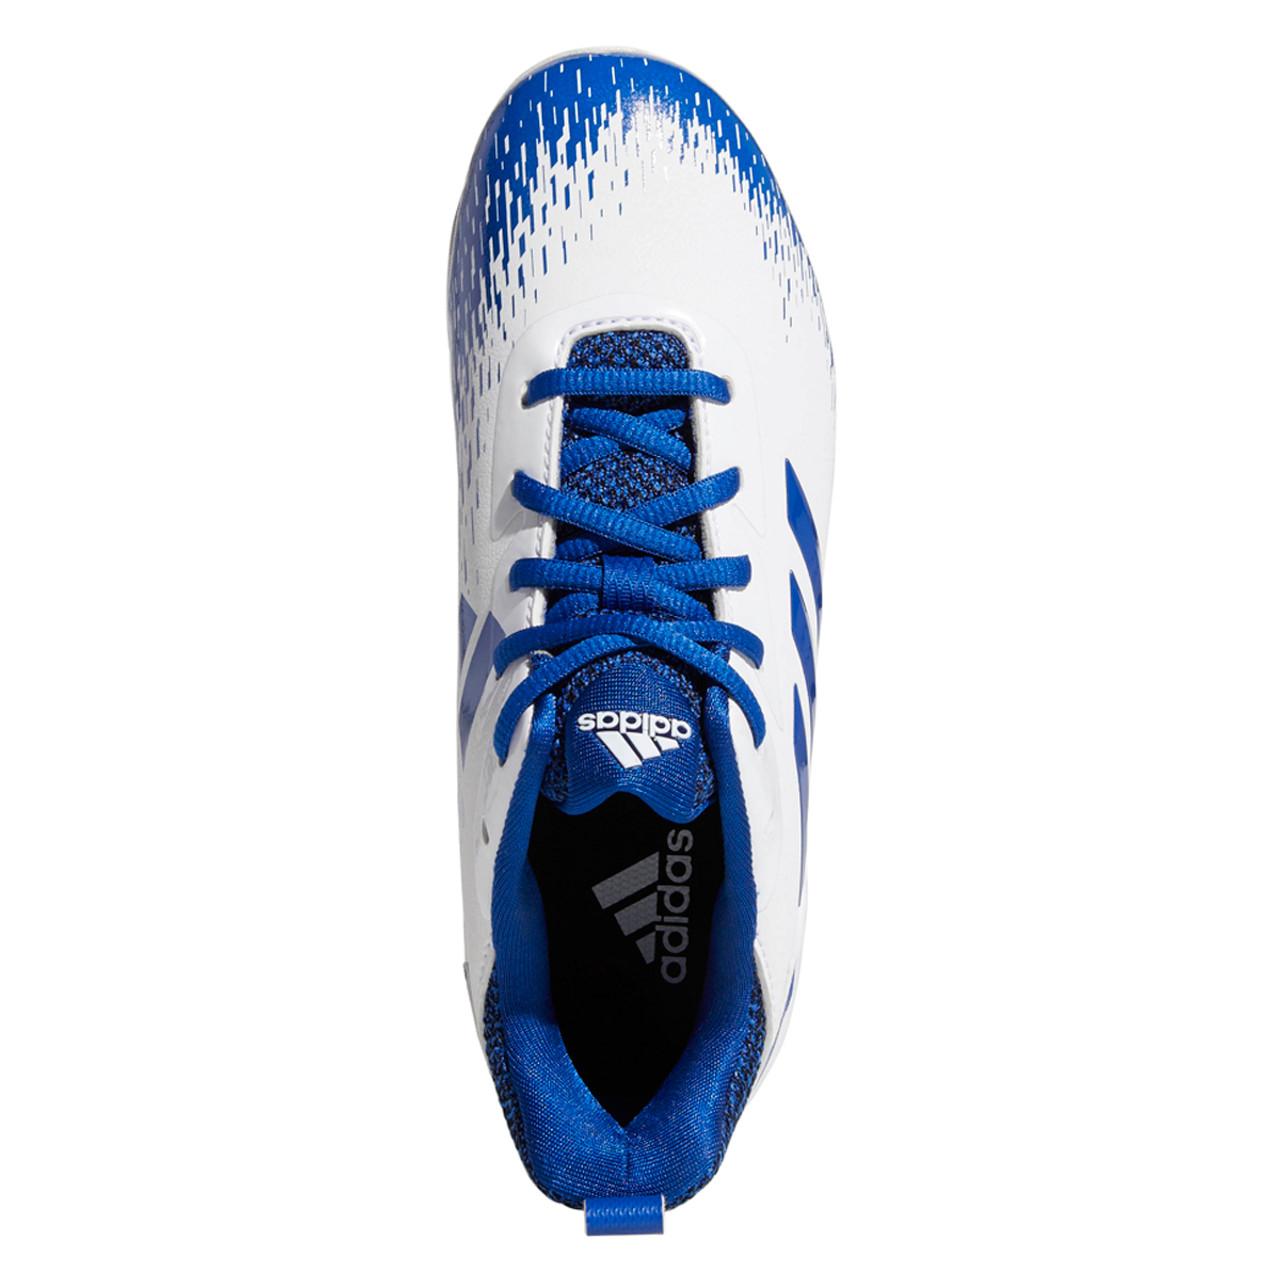 huge discount 55212 c224e ... Adidas Adizero Afterburner V MD Youth Baseball Cleats CG5239 ...